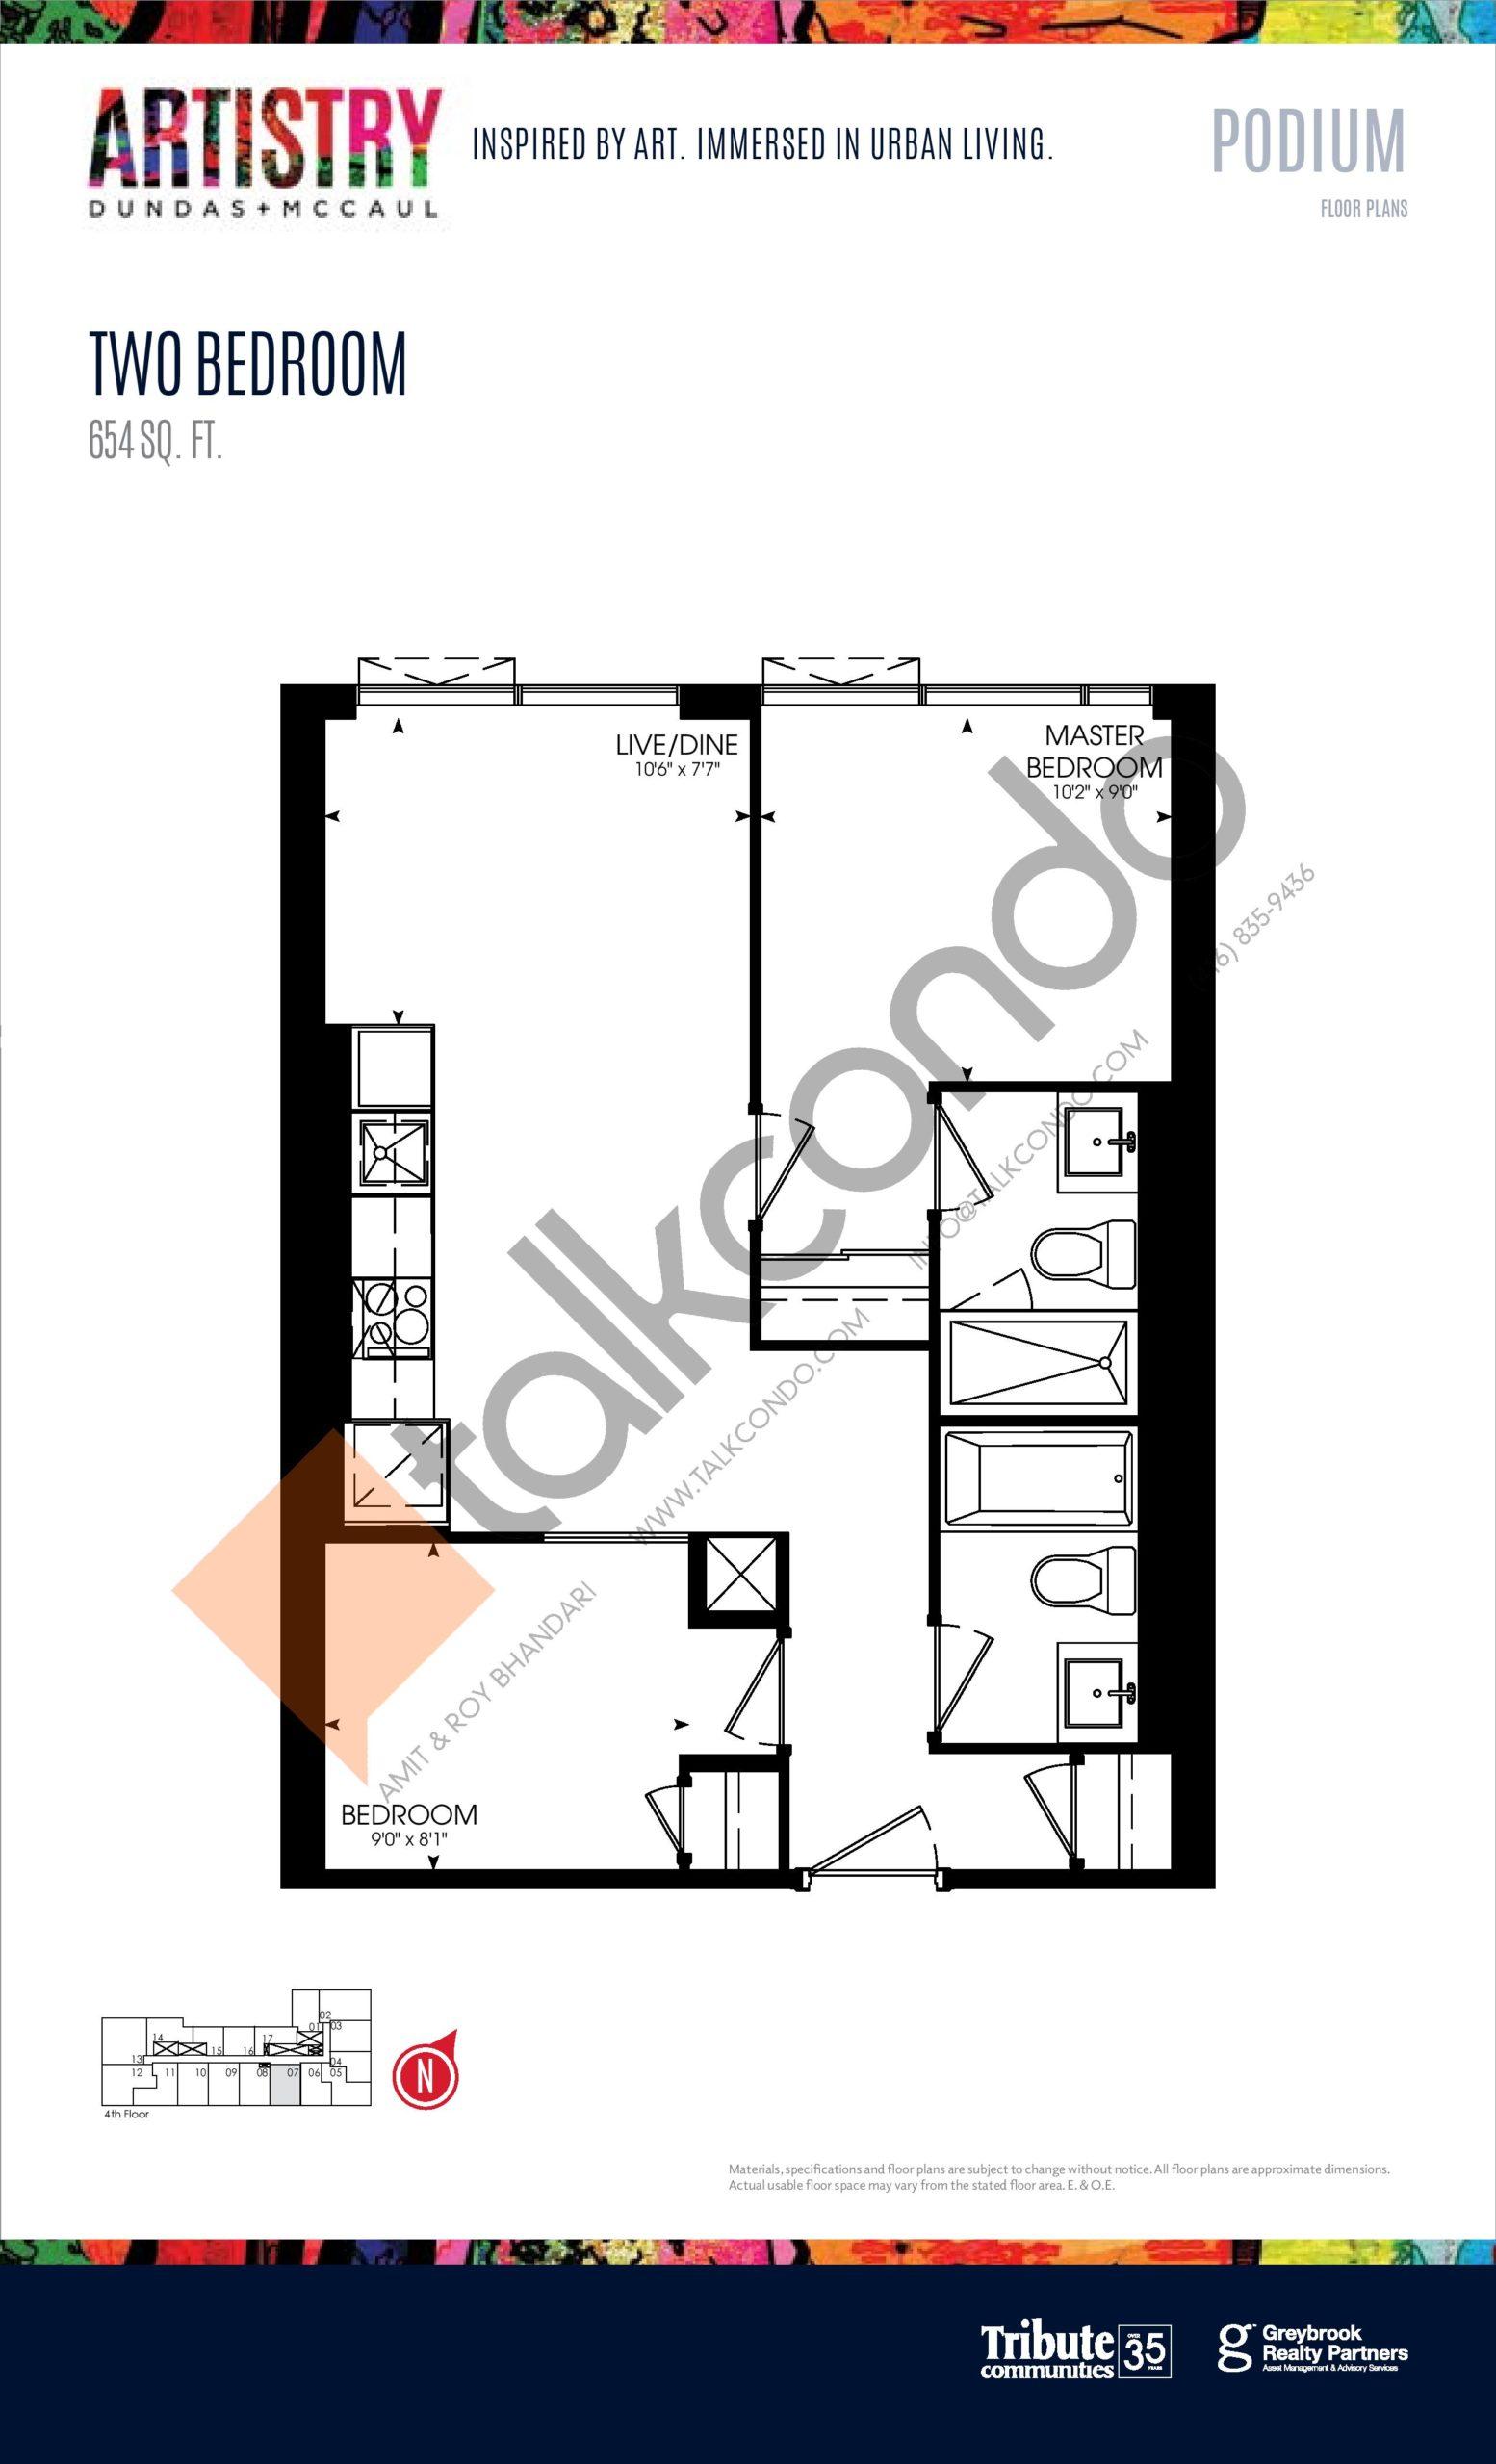 654 sq. ft. - Podium Floor Plan at Artistry Condos - 654 sq.ft